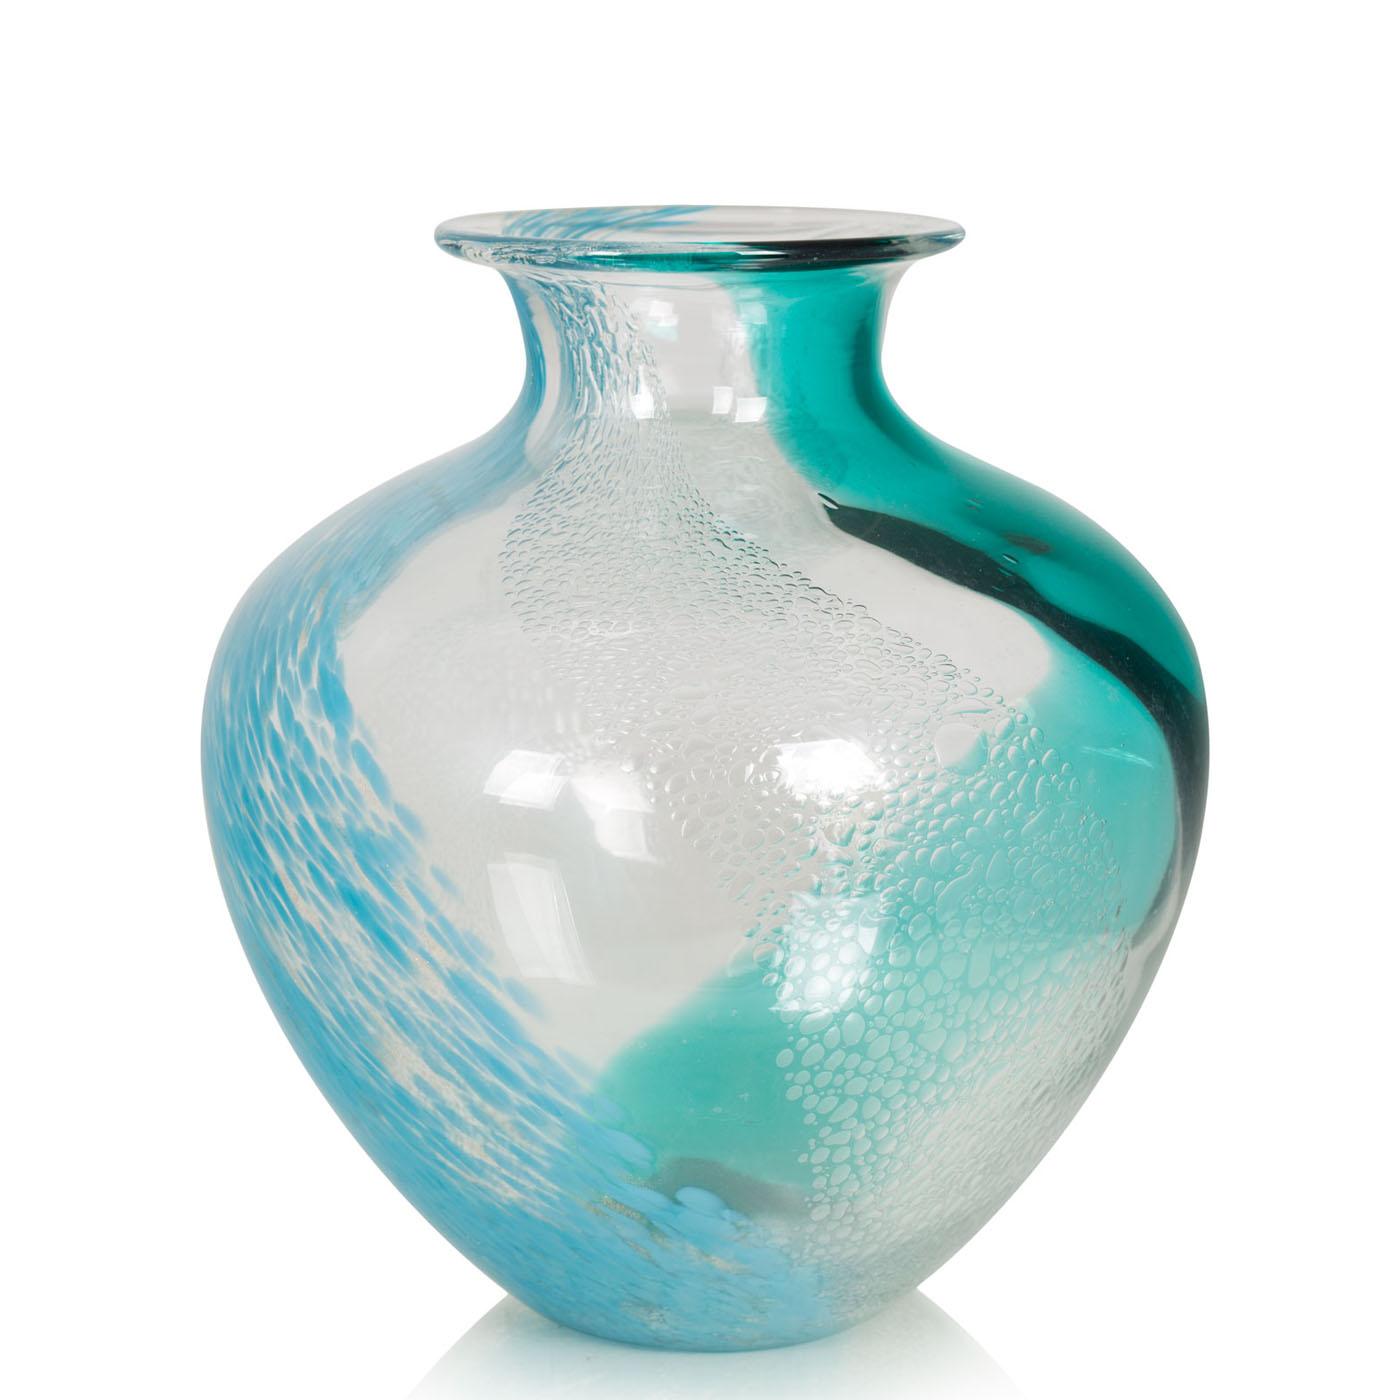 {} Home Philosophy Ваза Norine Цвет: Бирюзовый-Голубой (19х24 см) home philosophy ваза mariana цвет молочный набор